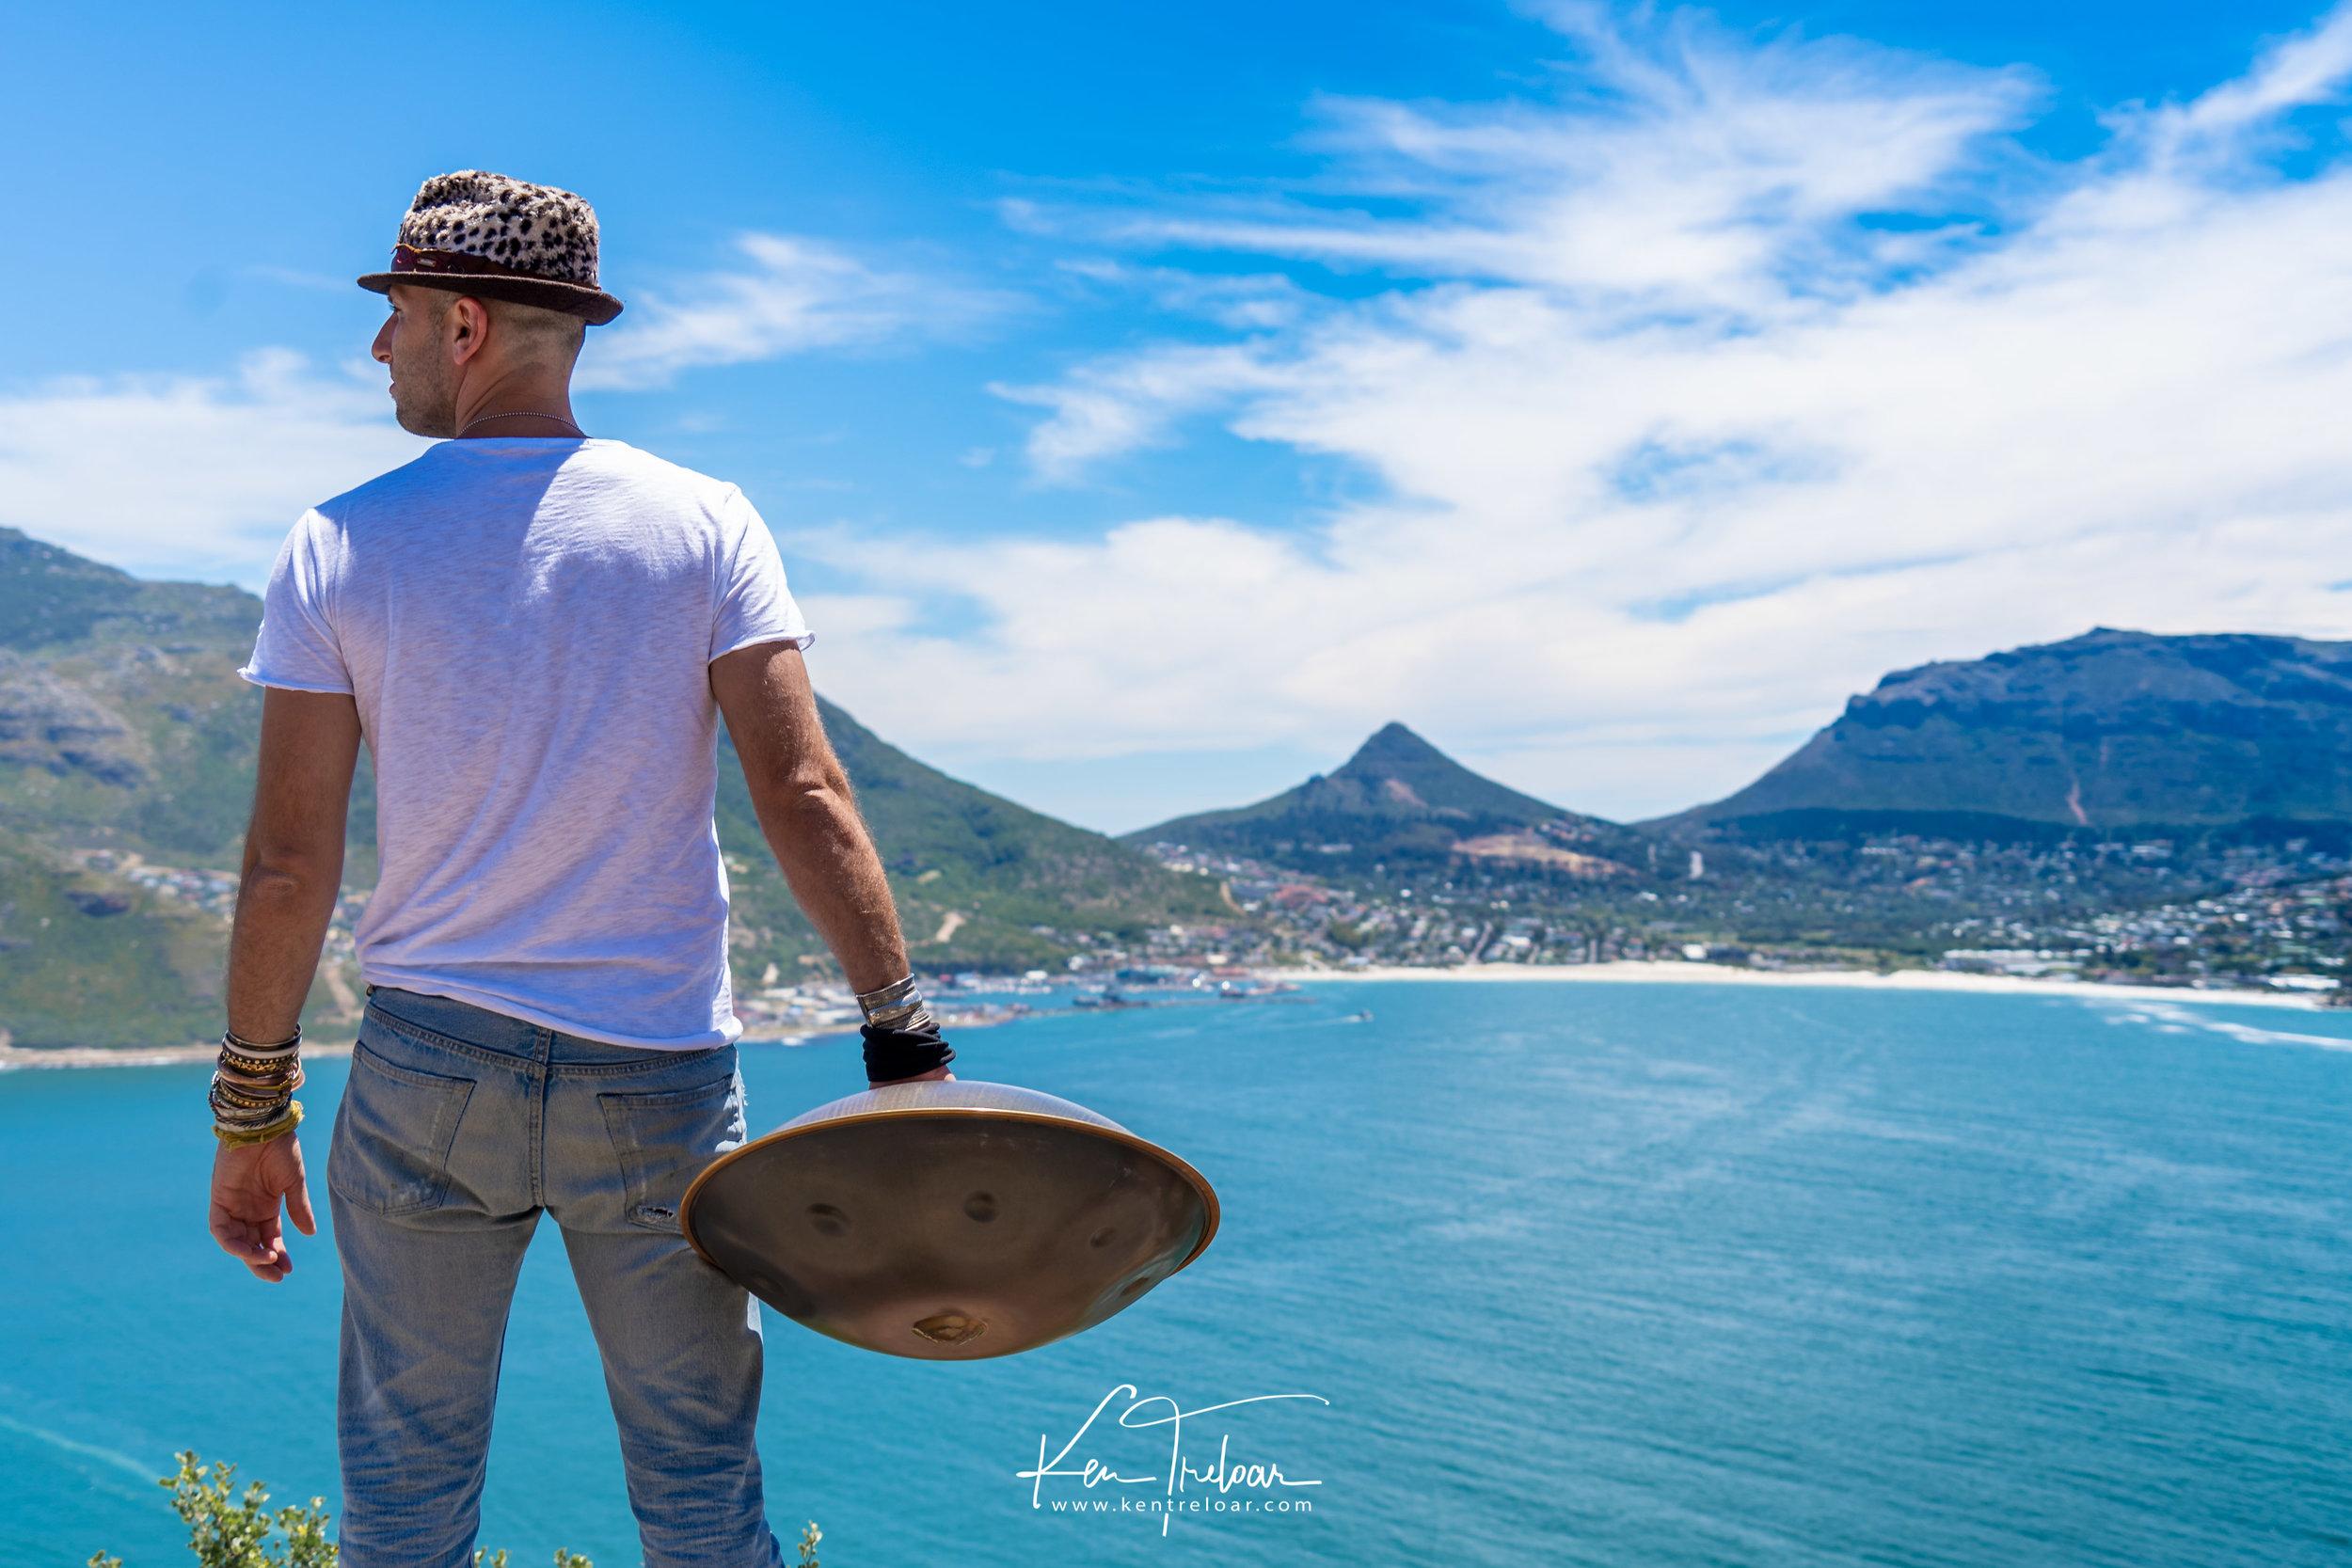 Marci Selvaggio - Hang Instrument Cape Town Tour - South Afica - Chapmans Peak Drive - Image by Ken Treloar-3.jpg